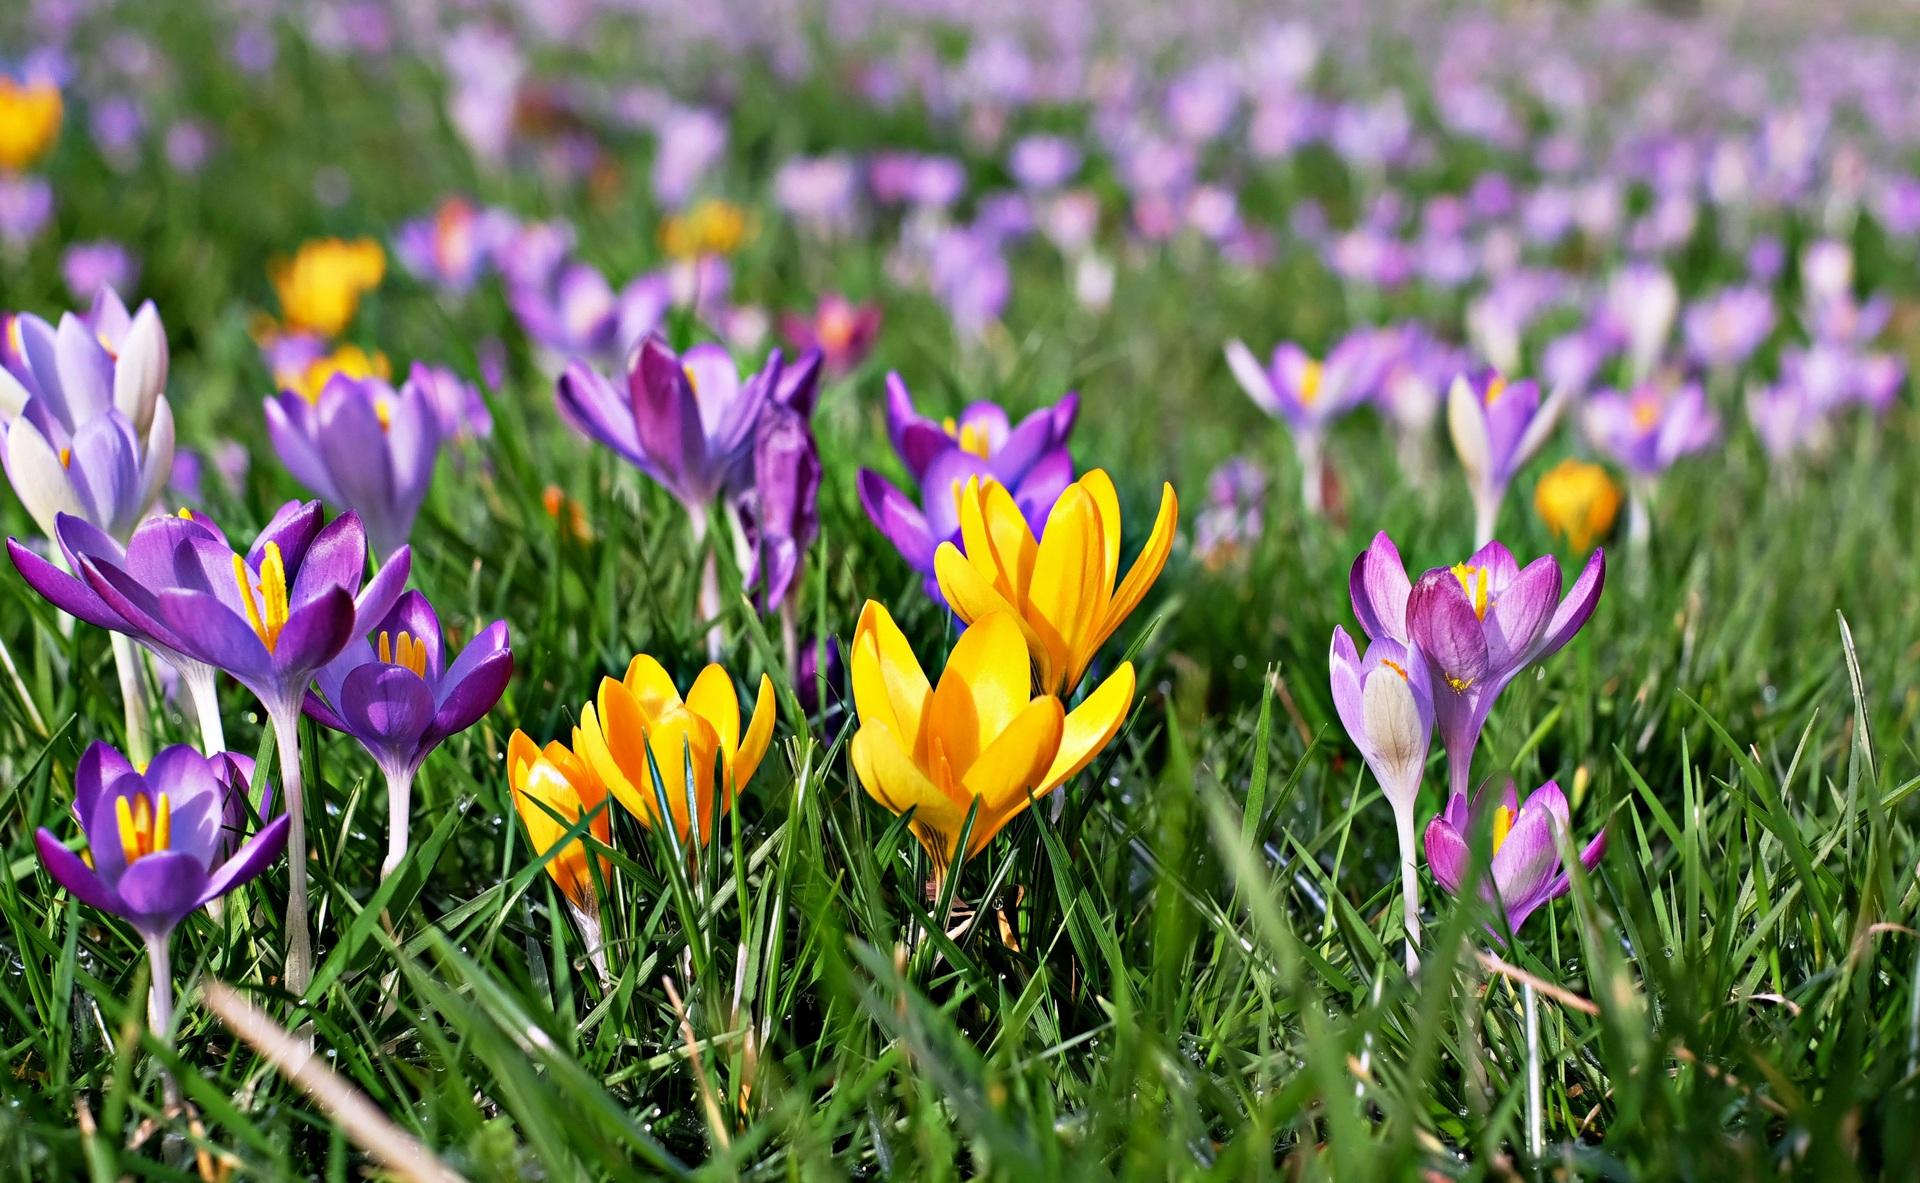 фото цветы весна в полях майдонини таржима ?илганда